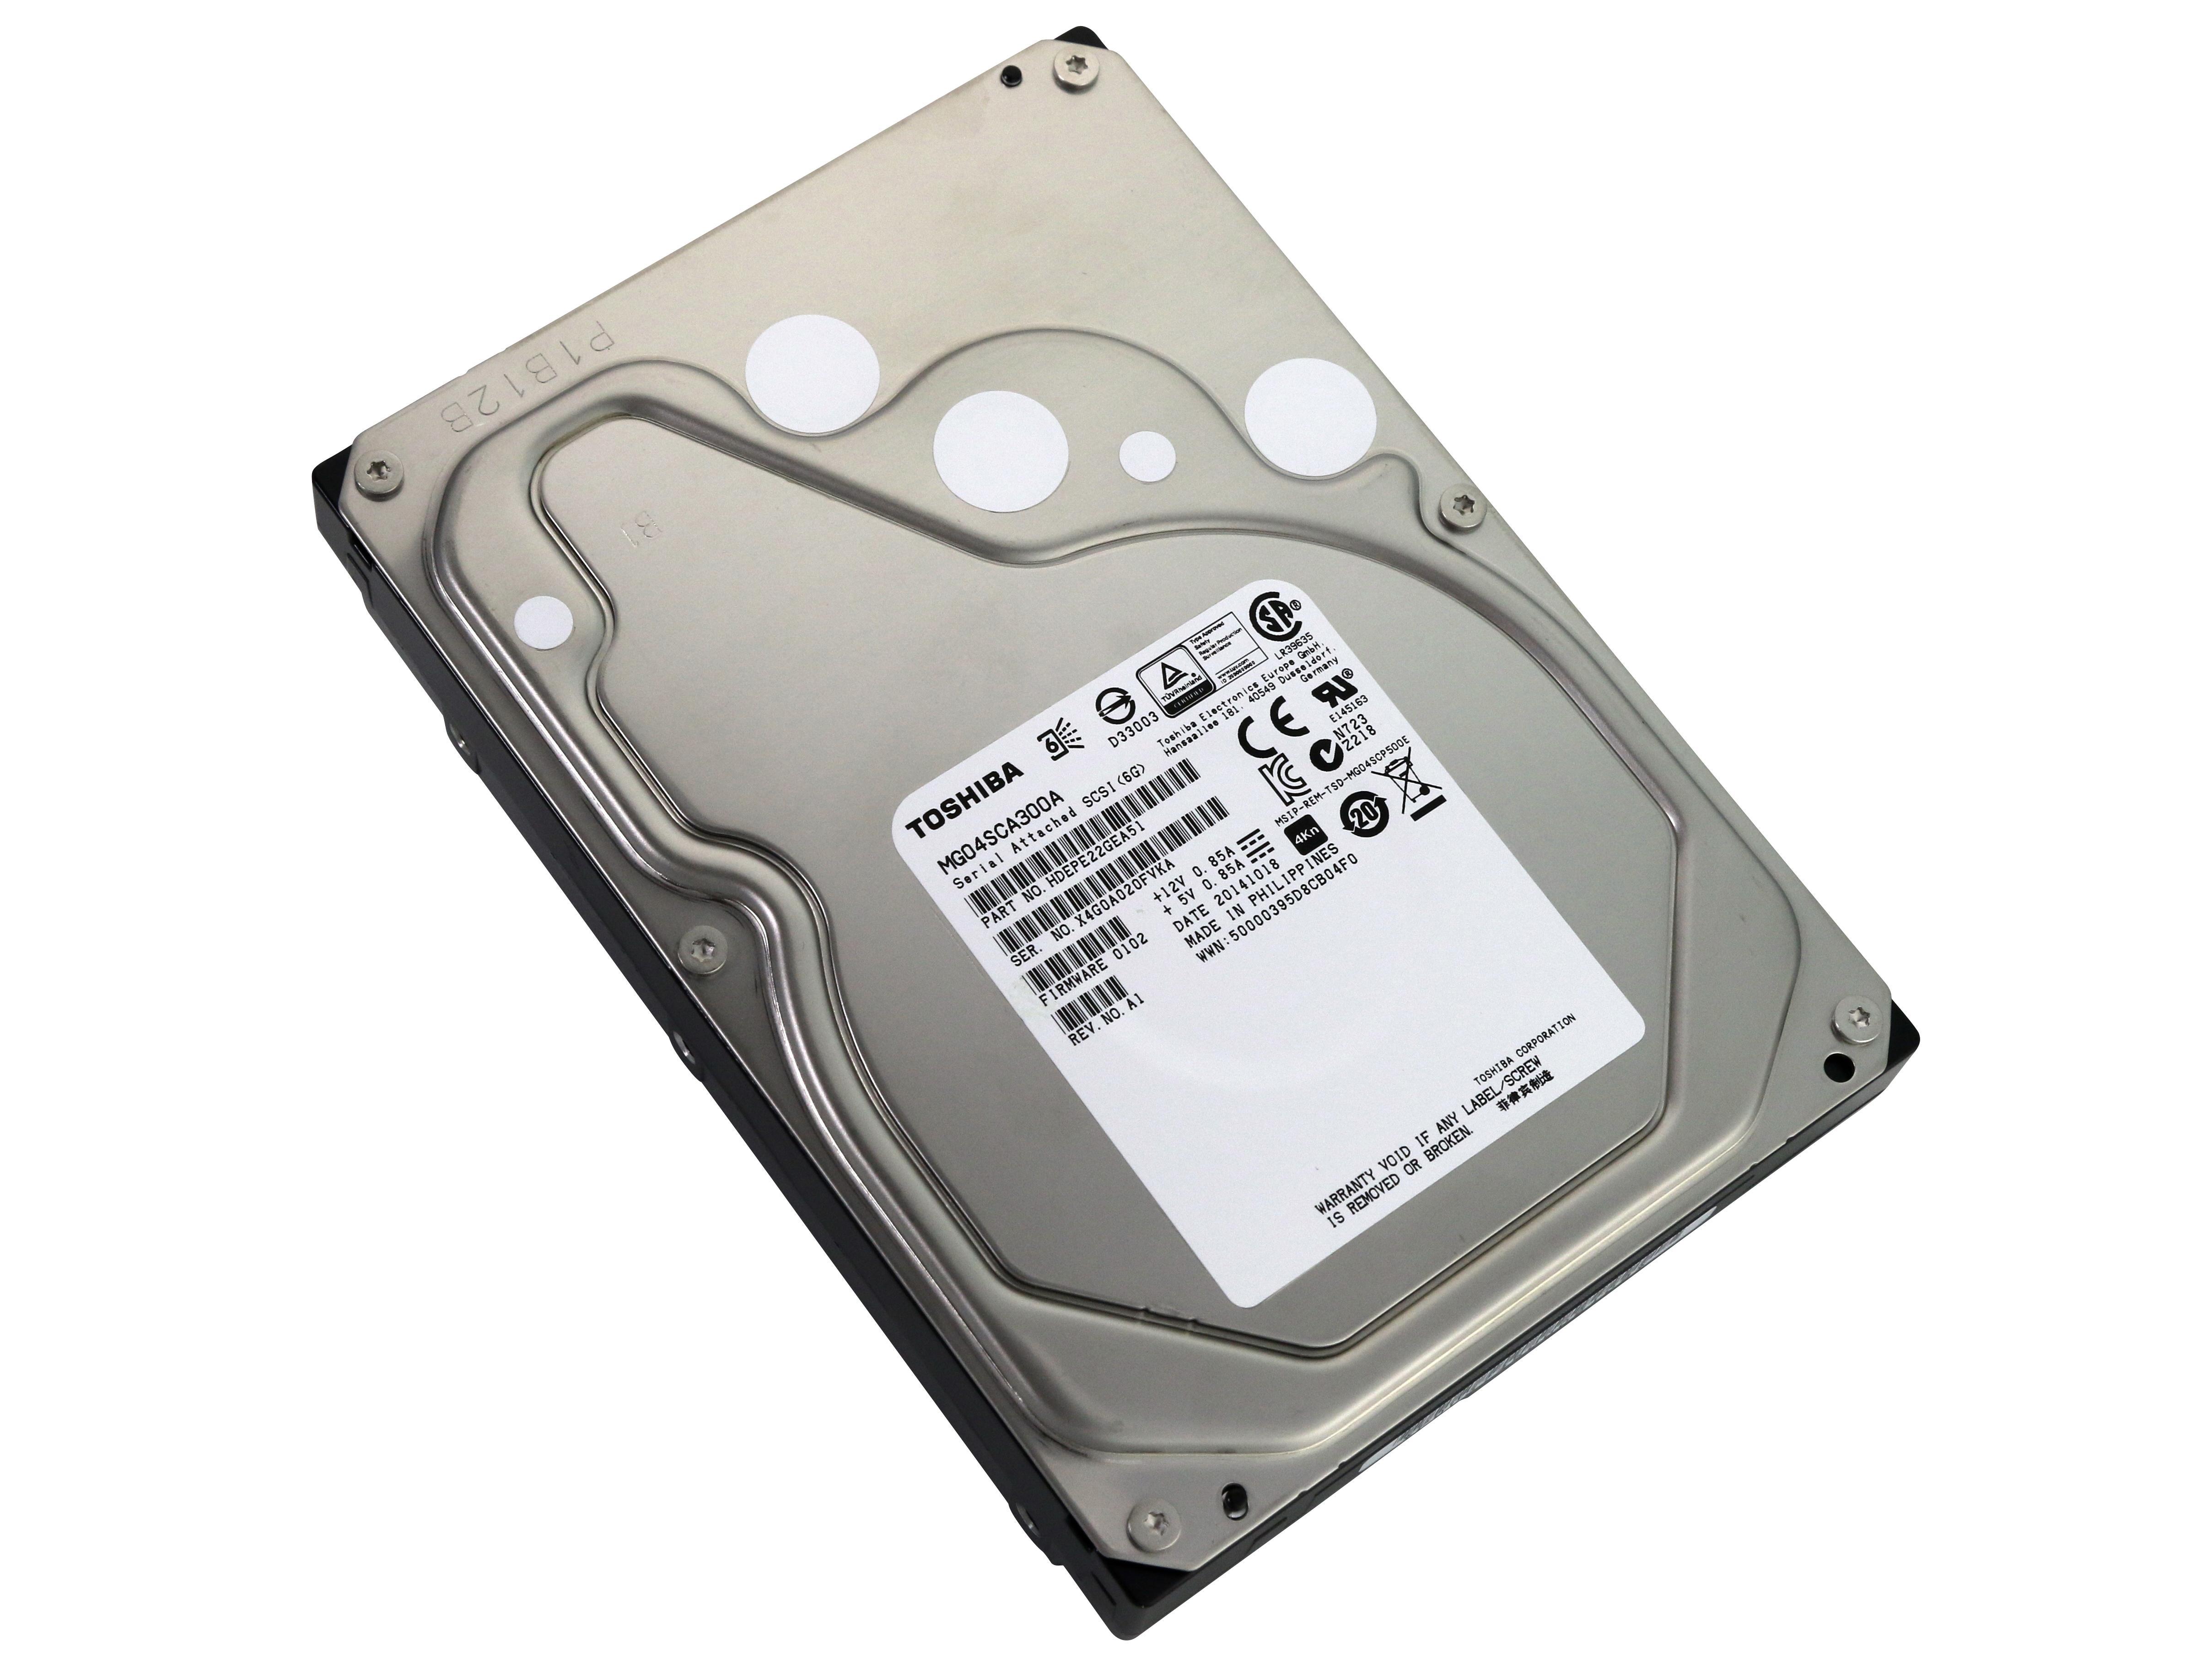 Toshiba MG04SCA300A HDEPR13GEA51 SAS 3TB 3000GB Enterprise Hard Drive image 1